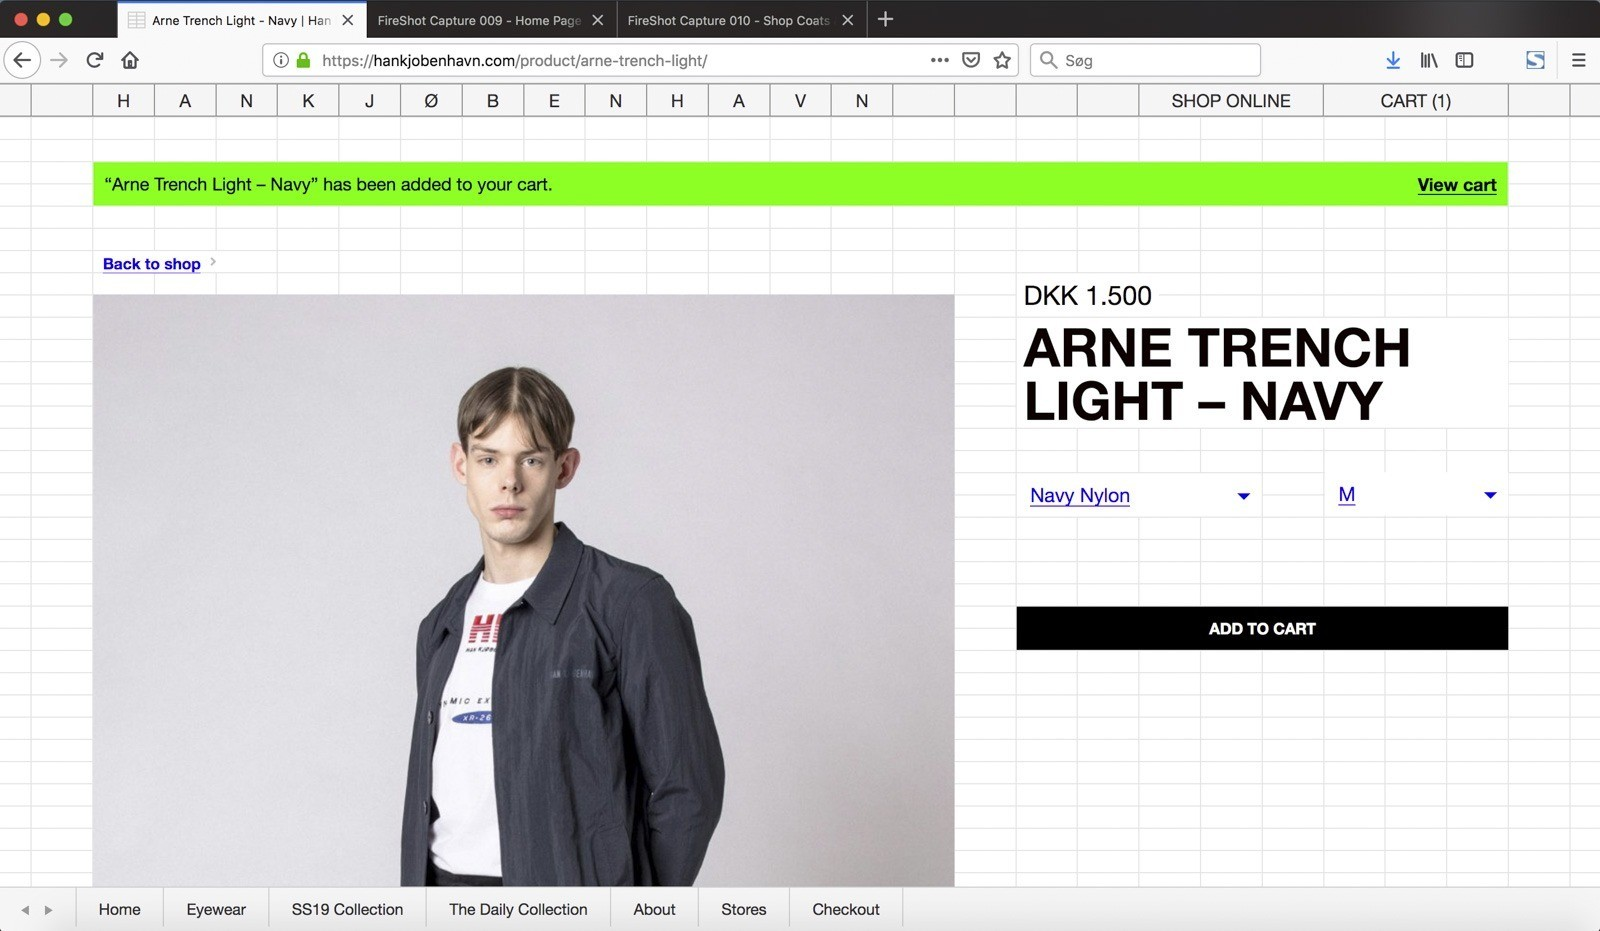 Han Kjøbenhavns website - single product view